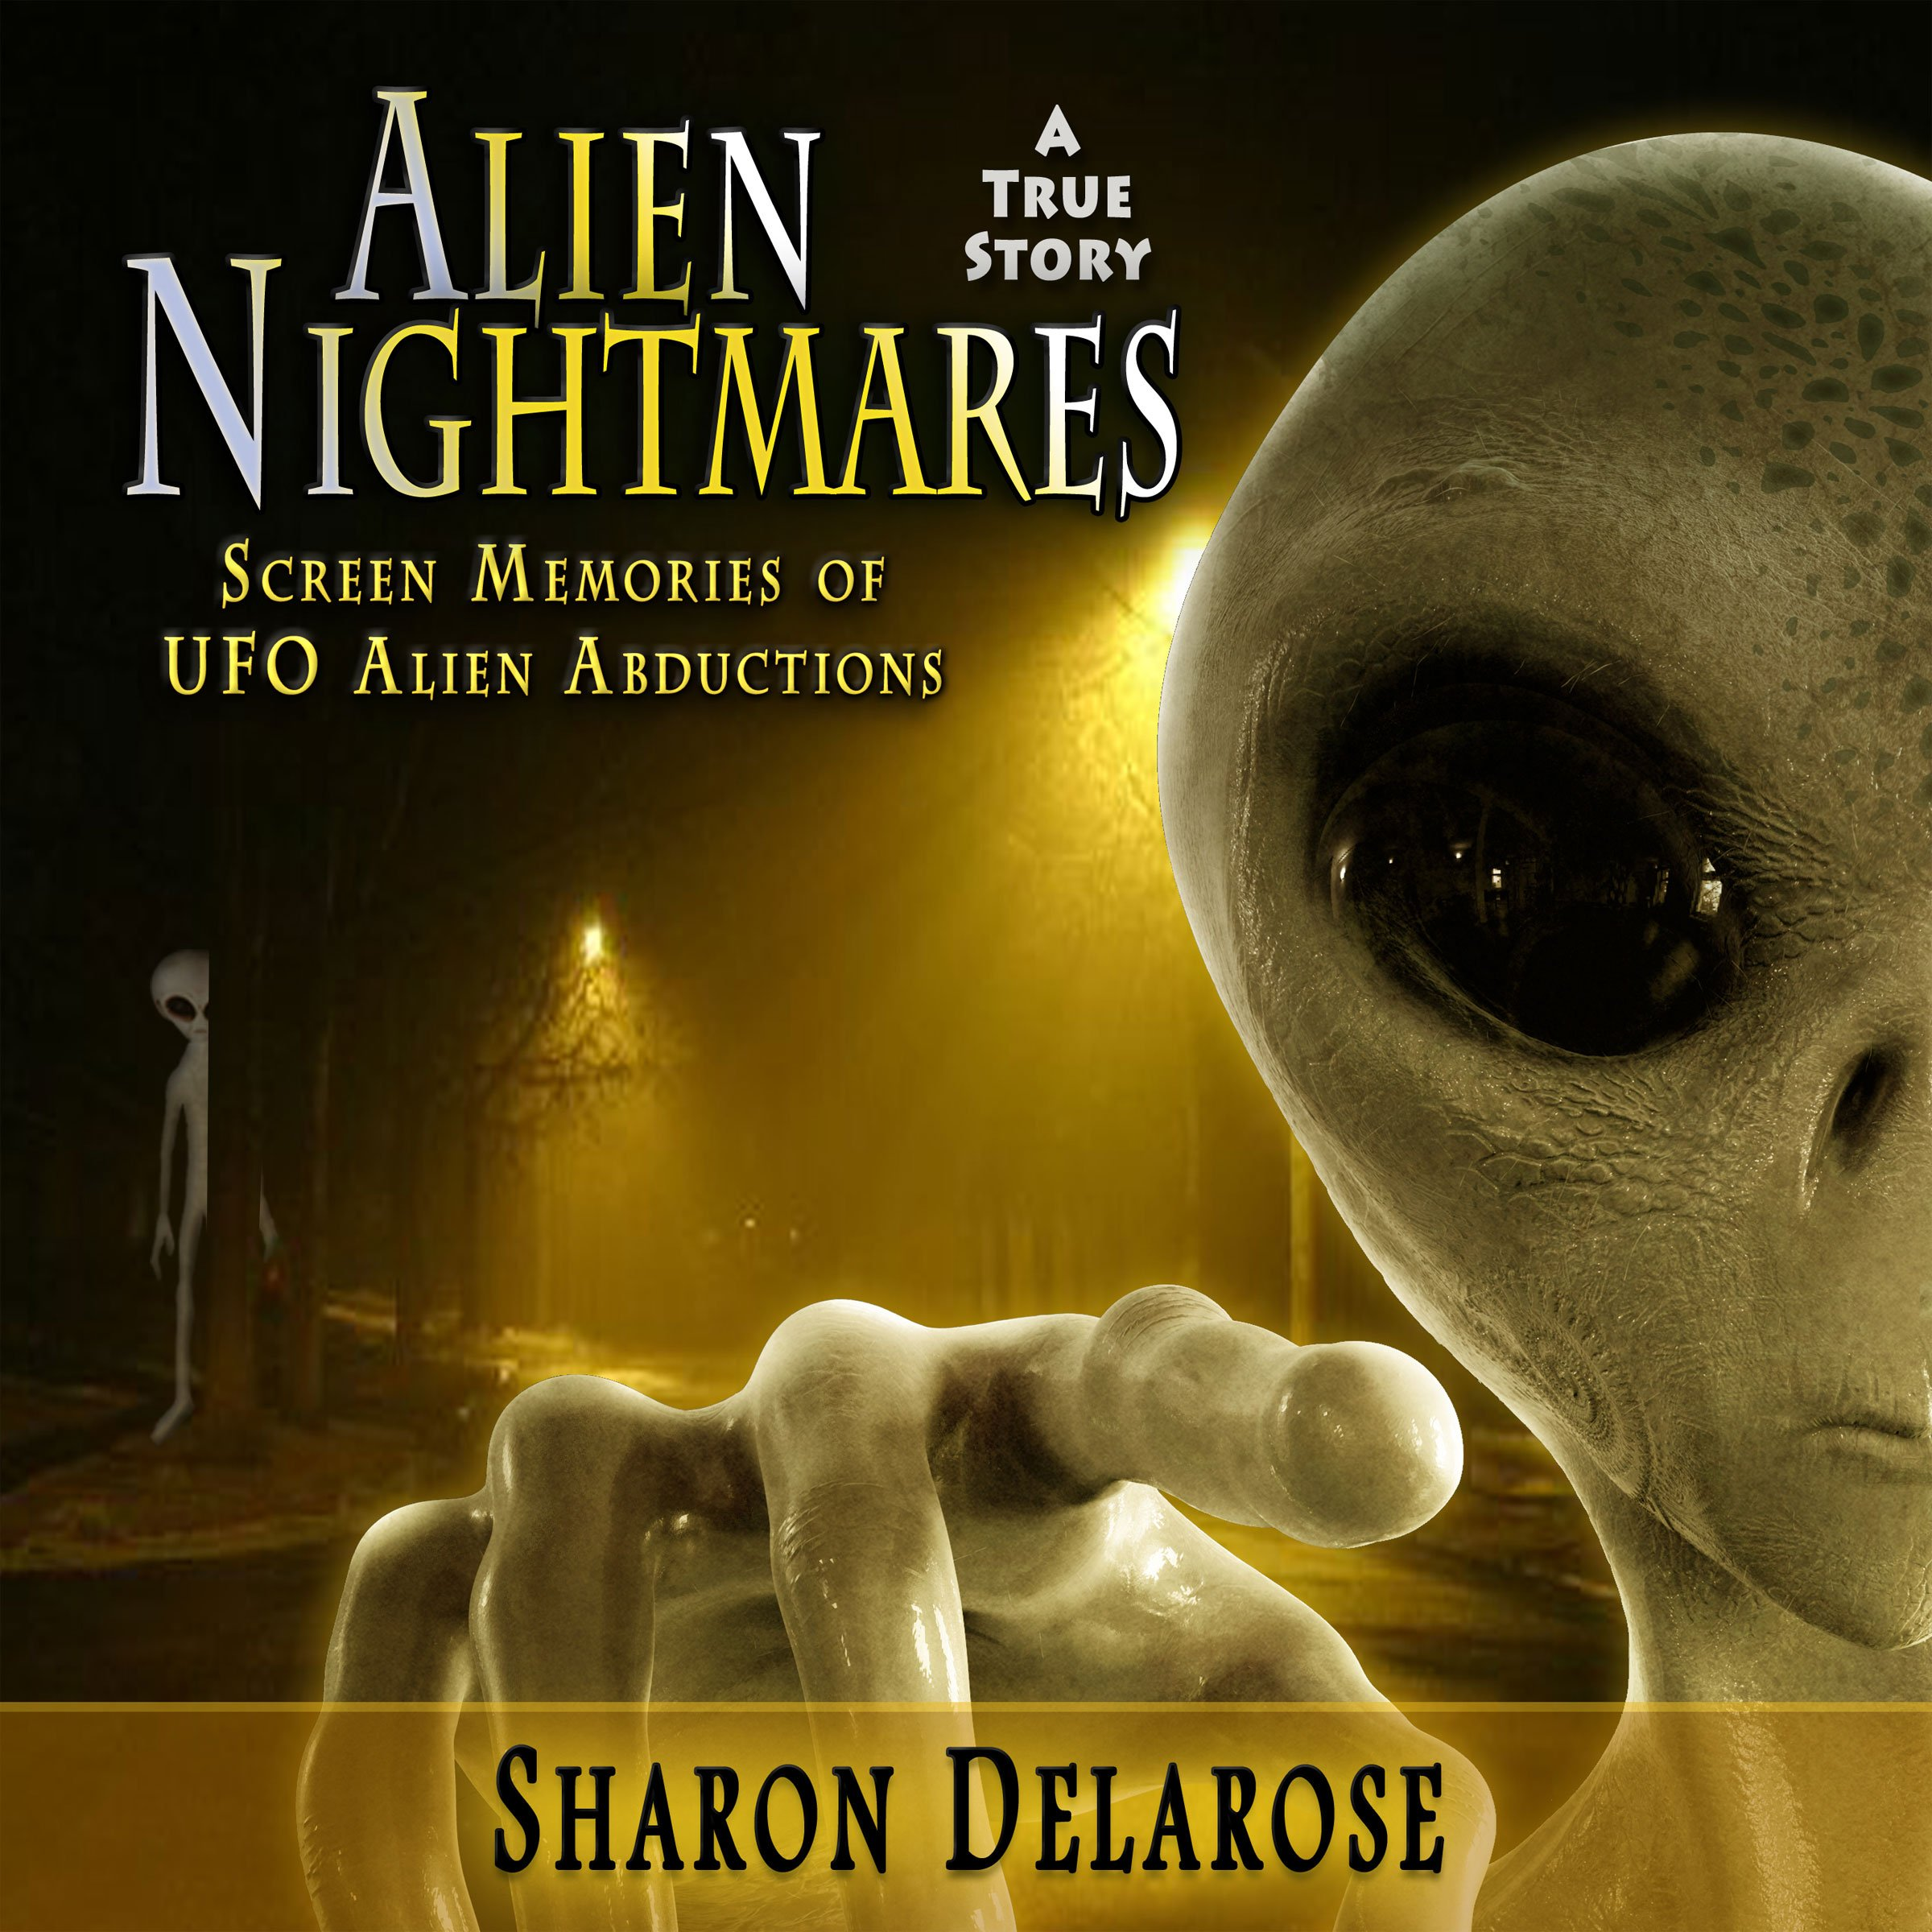 Alien Nightmares: Screen Memories of UFO Alien Abductions: Abducted by Aliens for Decades